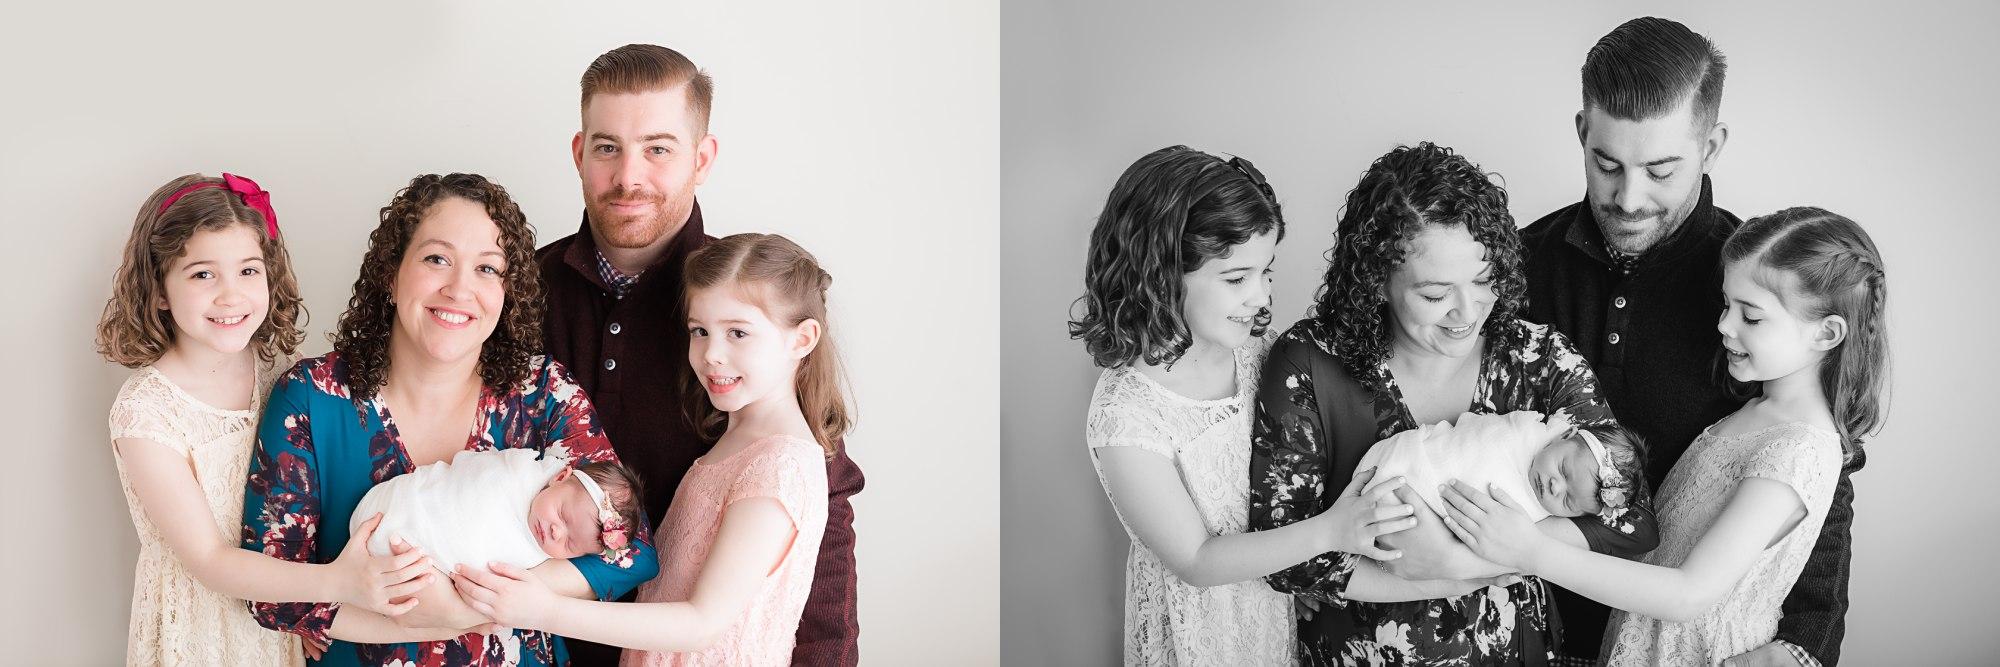 Quakertown Newborn Photographer Family